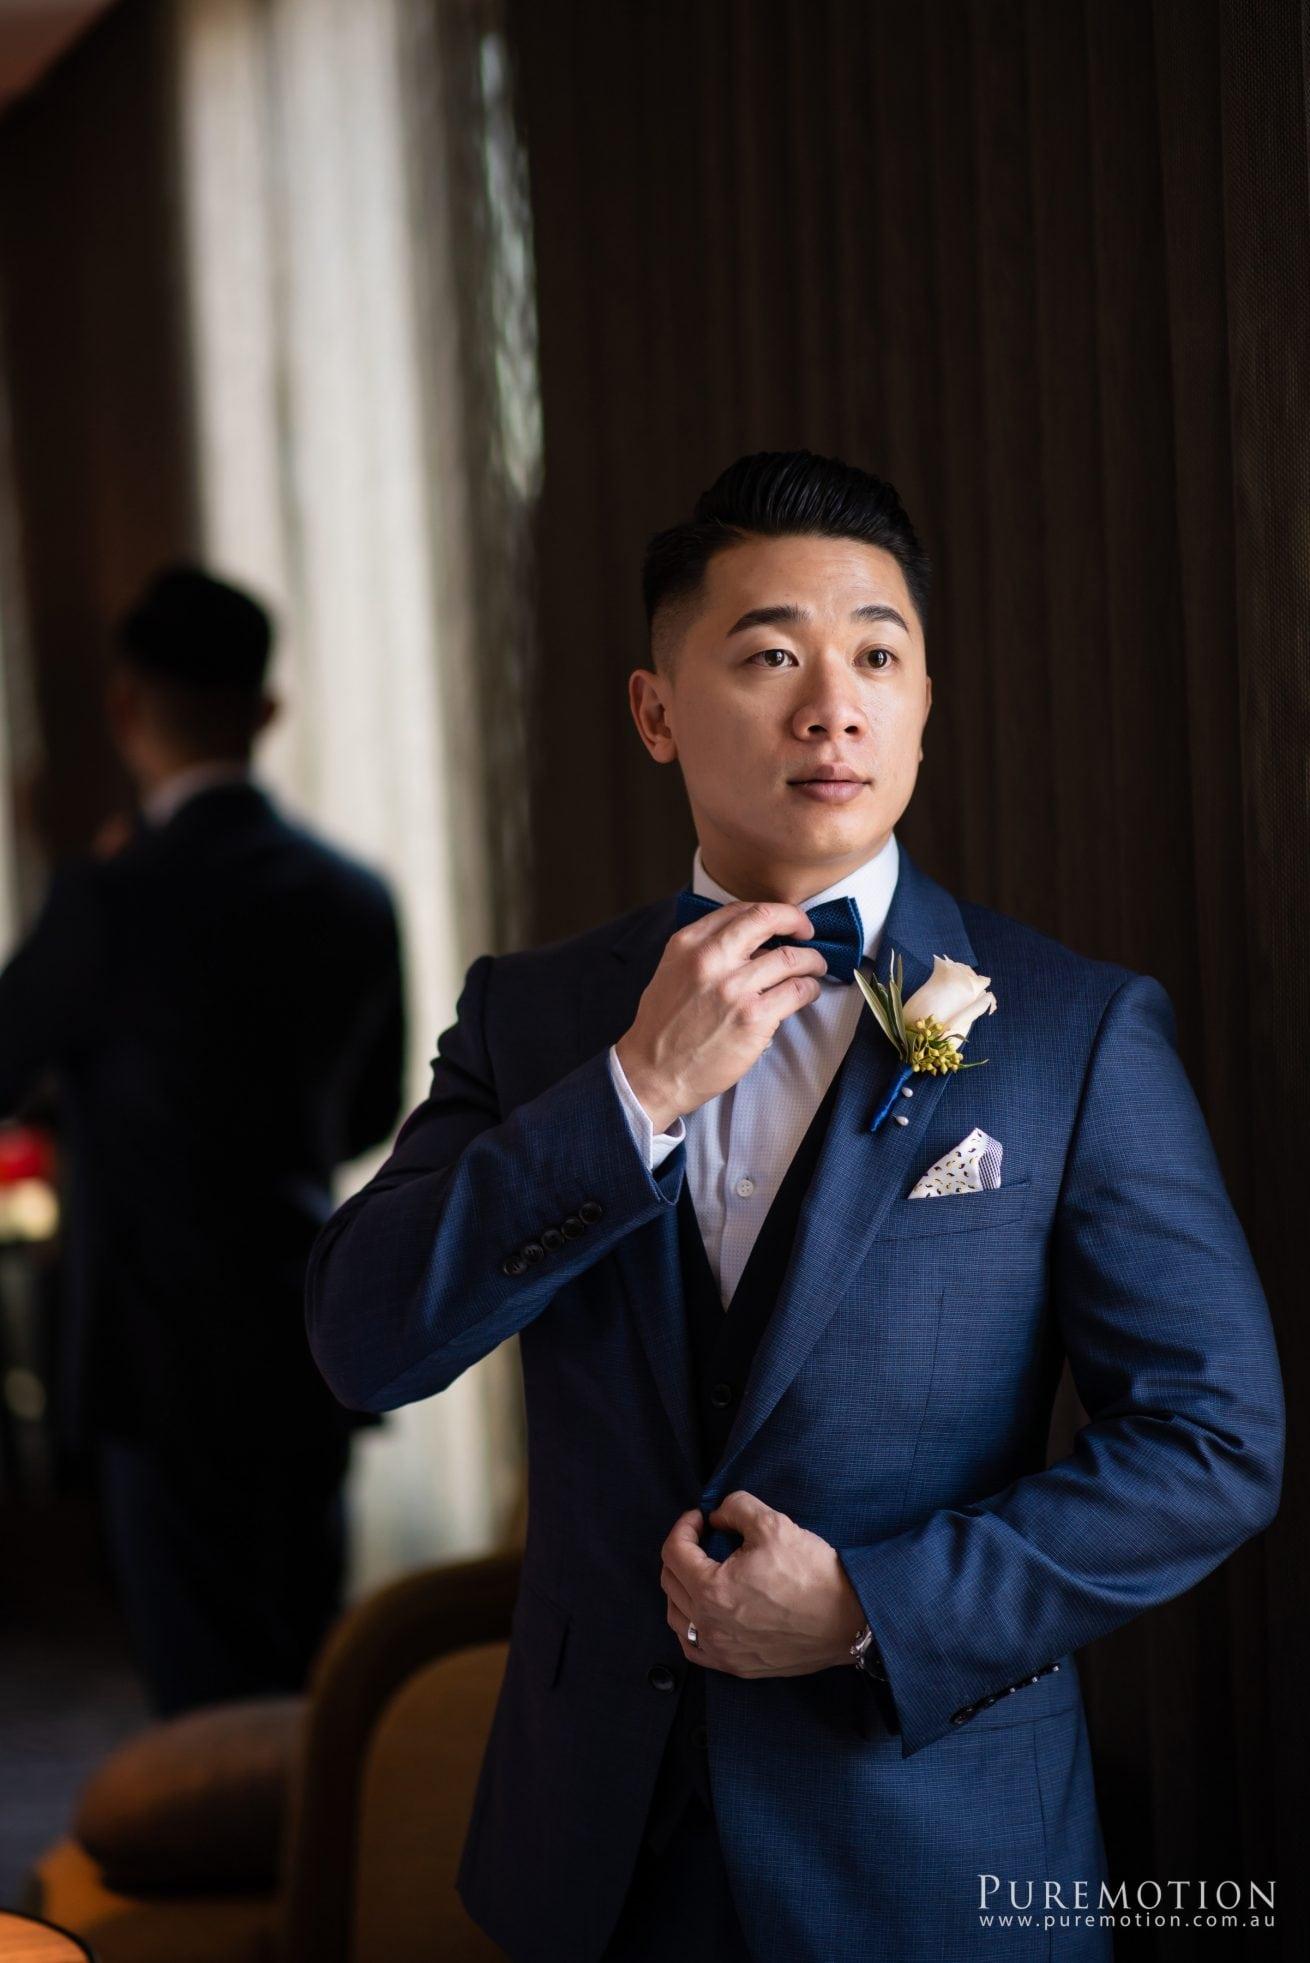 Puremotion Wedding Photography Alex Huang Brisbane W Hotel048